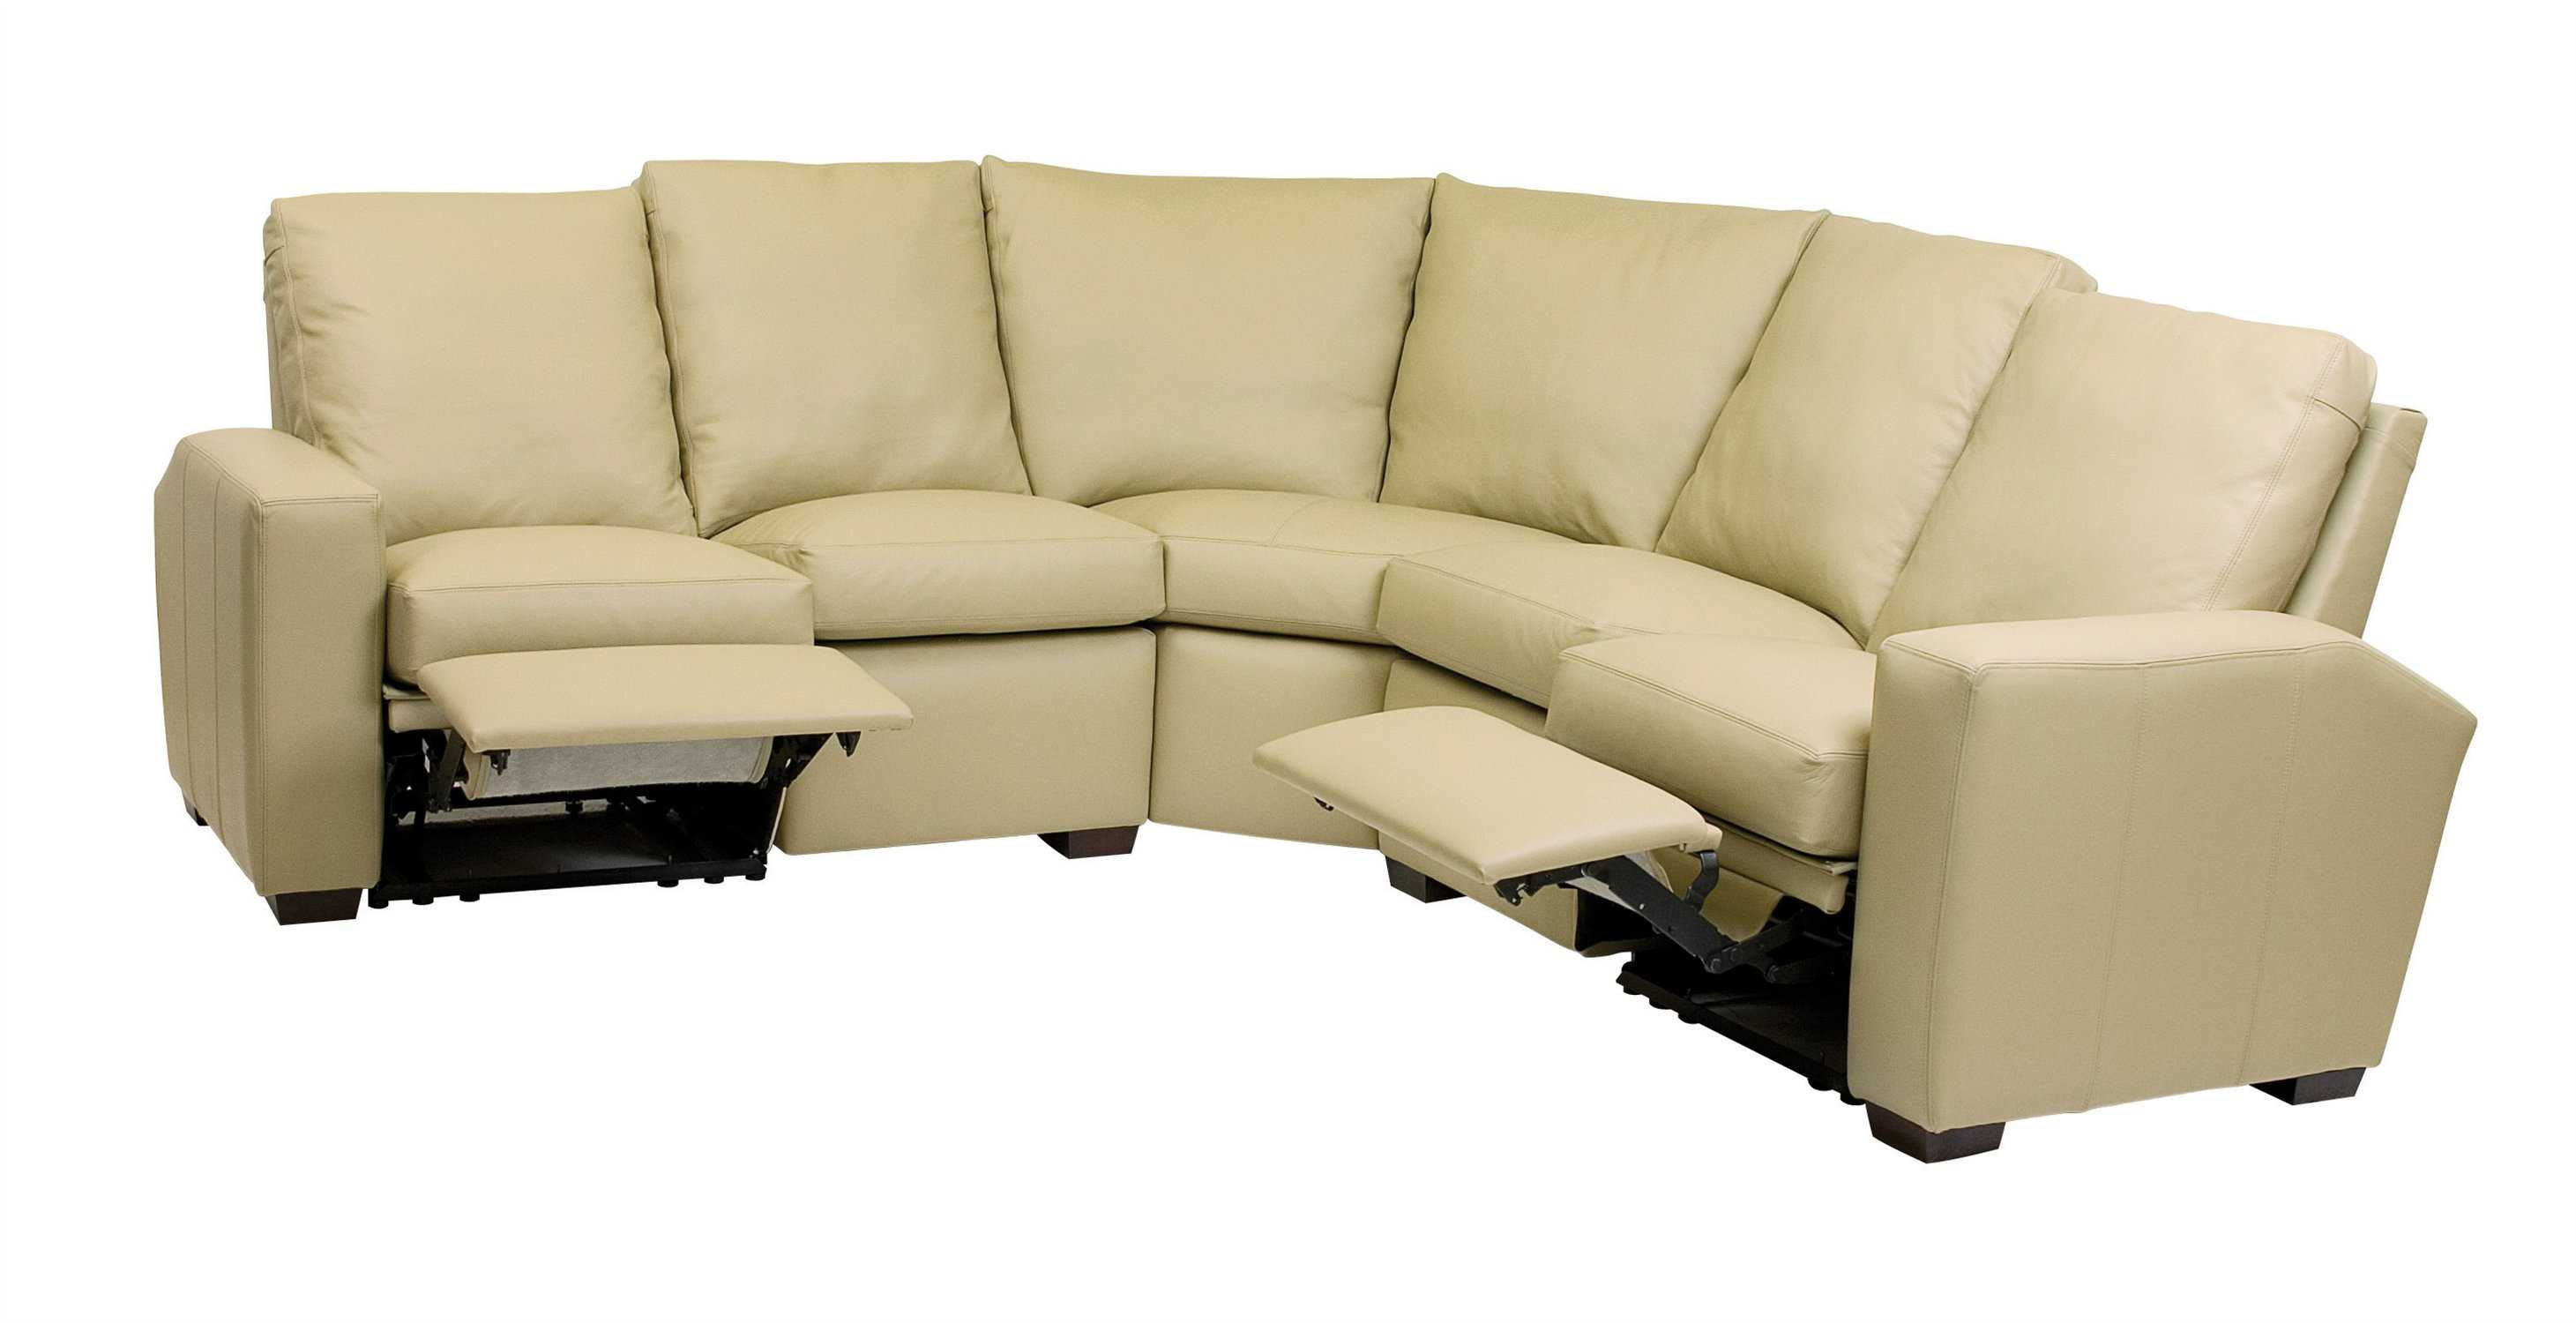 reclining sofa leather sectional rochdale vs chesterfield sofascore classic metro sfmetro1